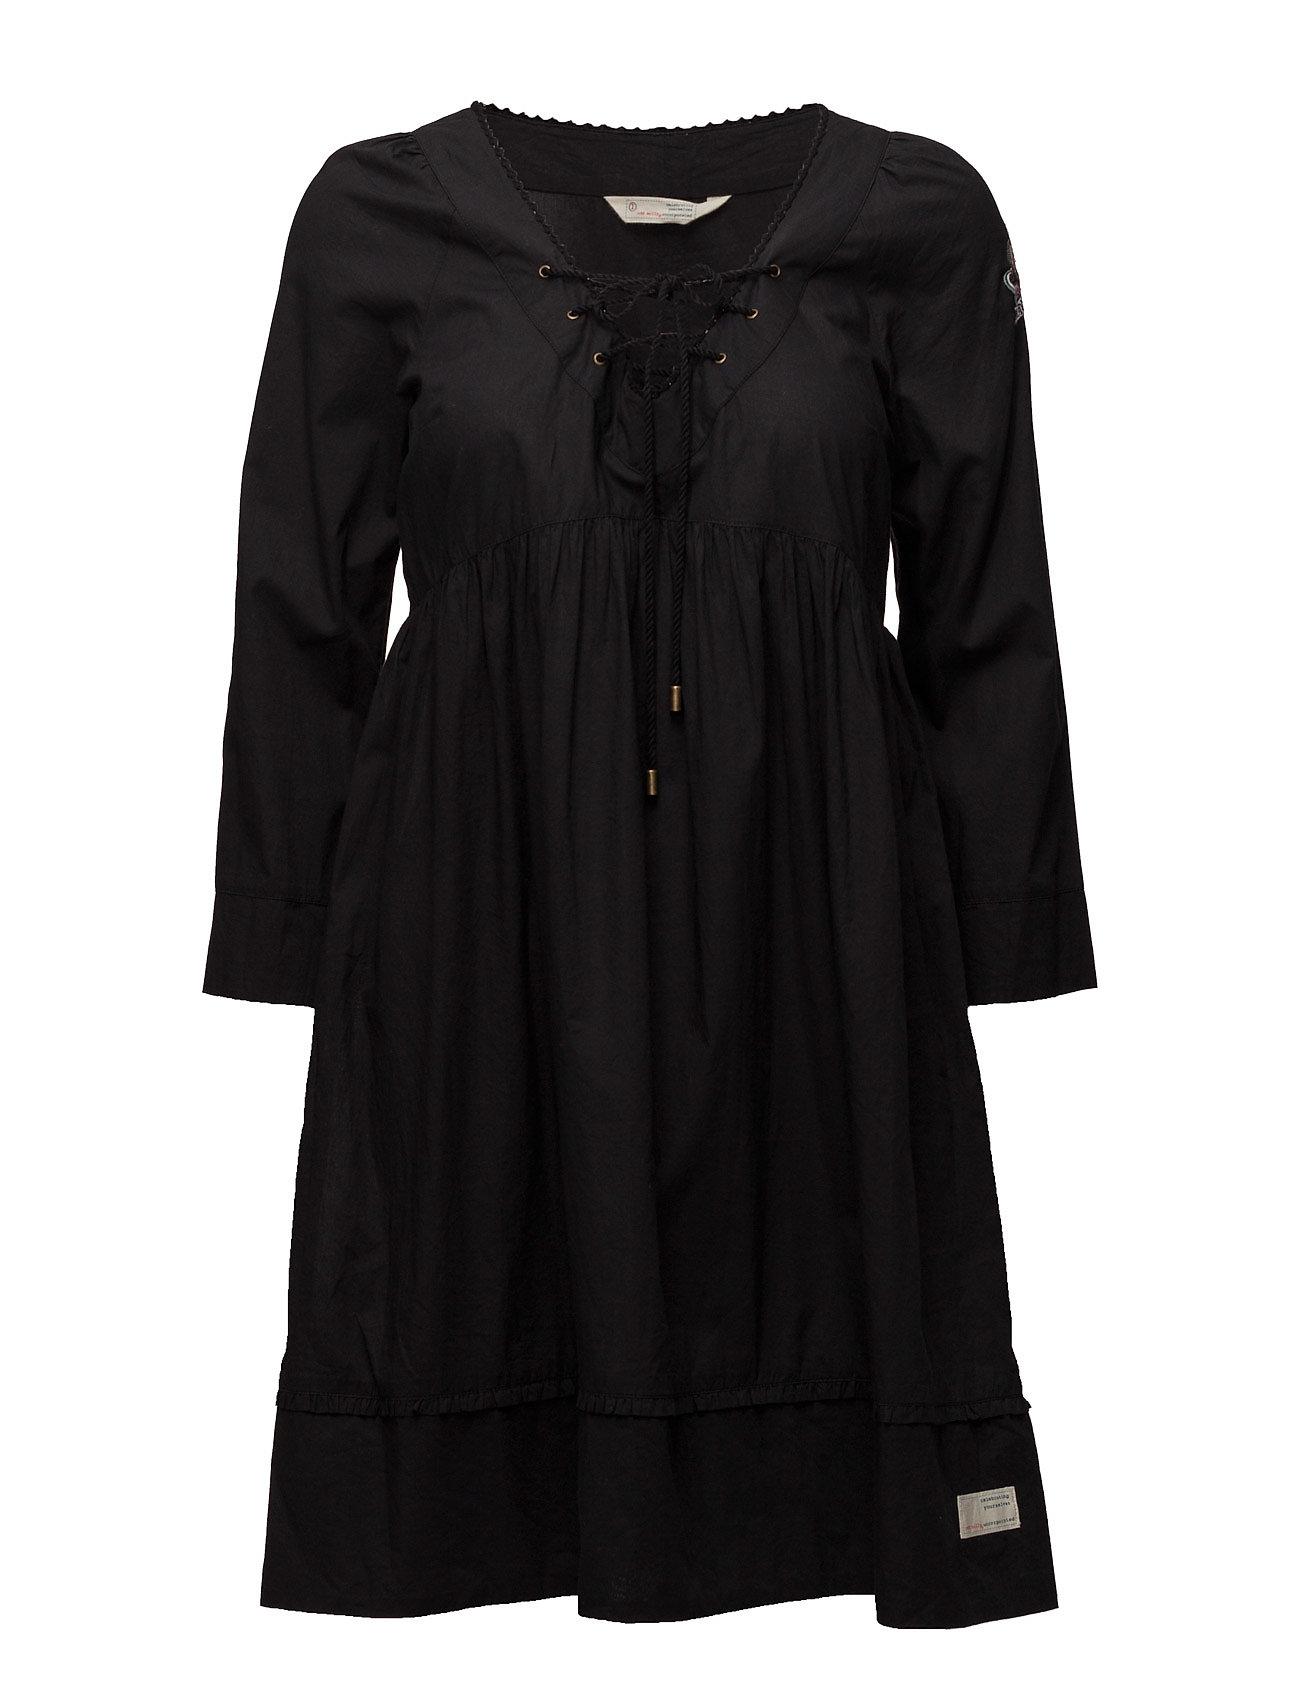 odd molly medley dress almost black g nstig schnell einkaufen. Black Bedroom Furniture Sets. Home Design Ideas